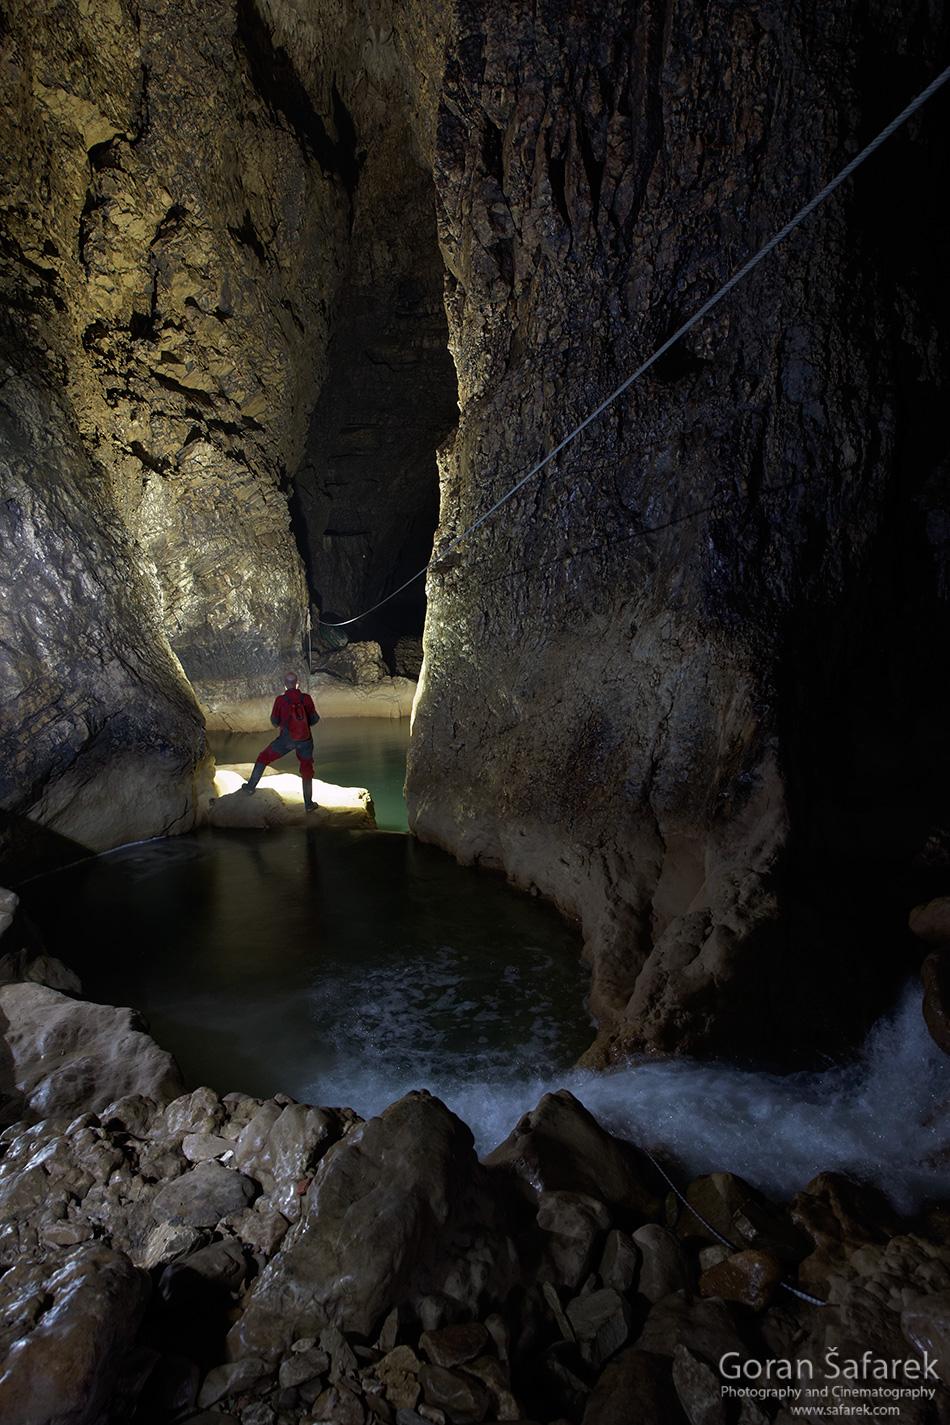 croatia, istria, pazin, pazinčica, cave, chams, abyss, caving